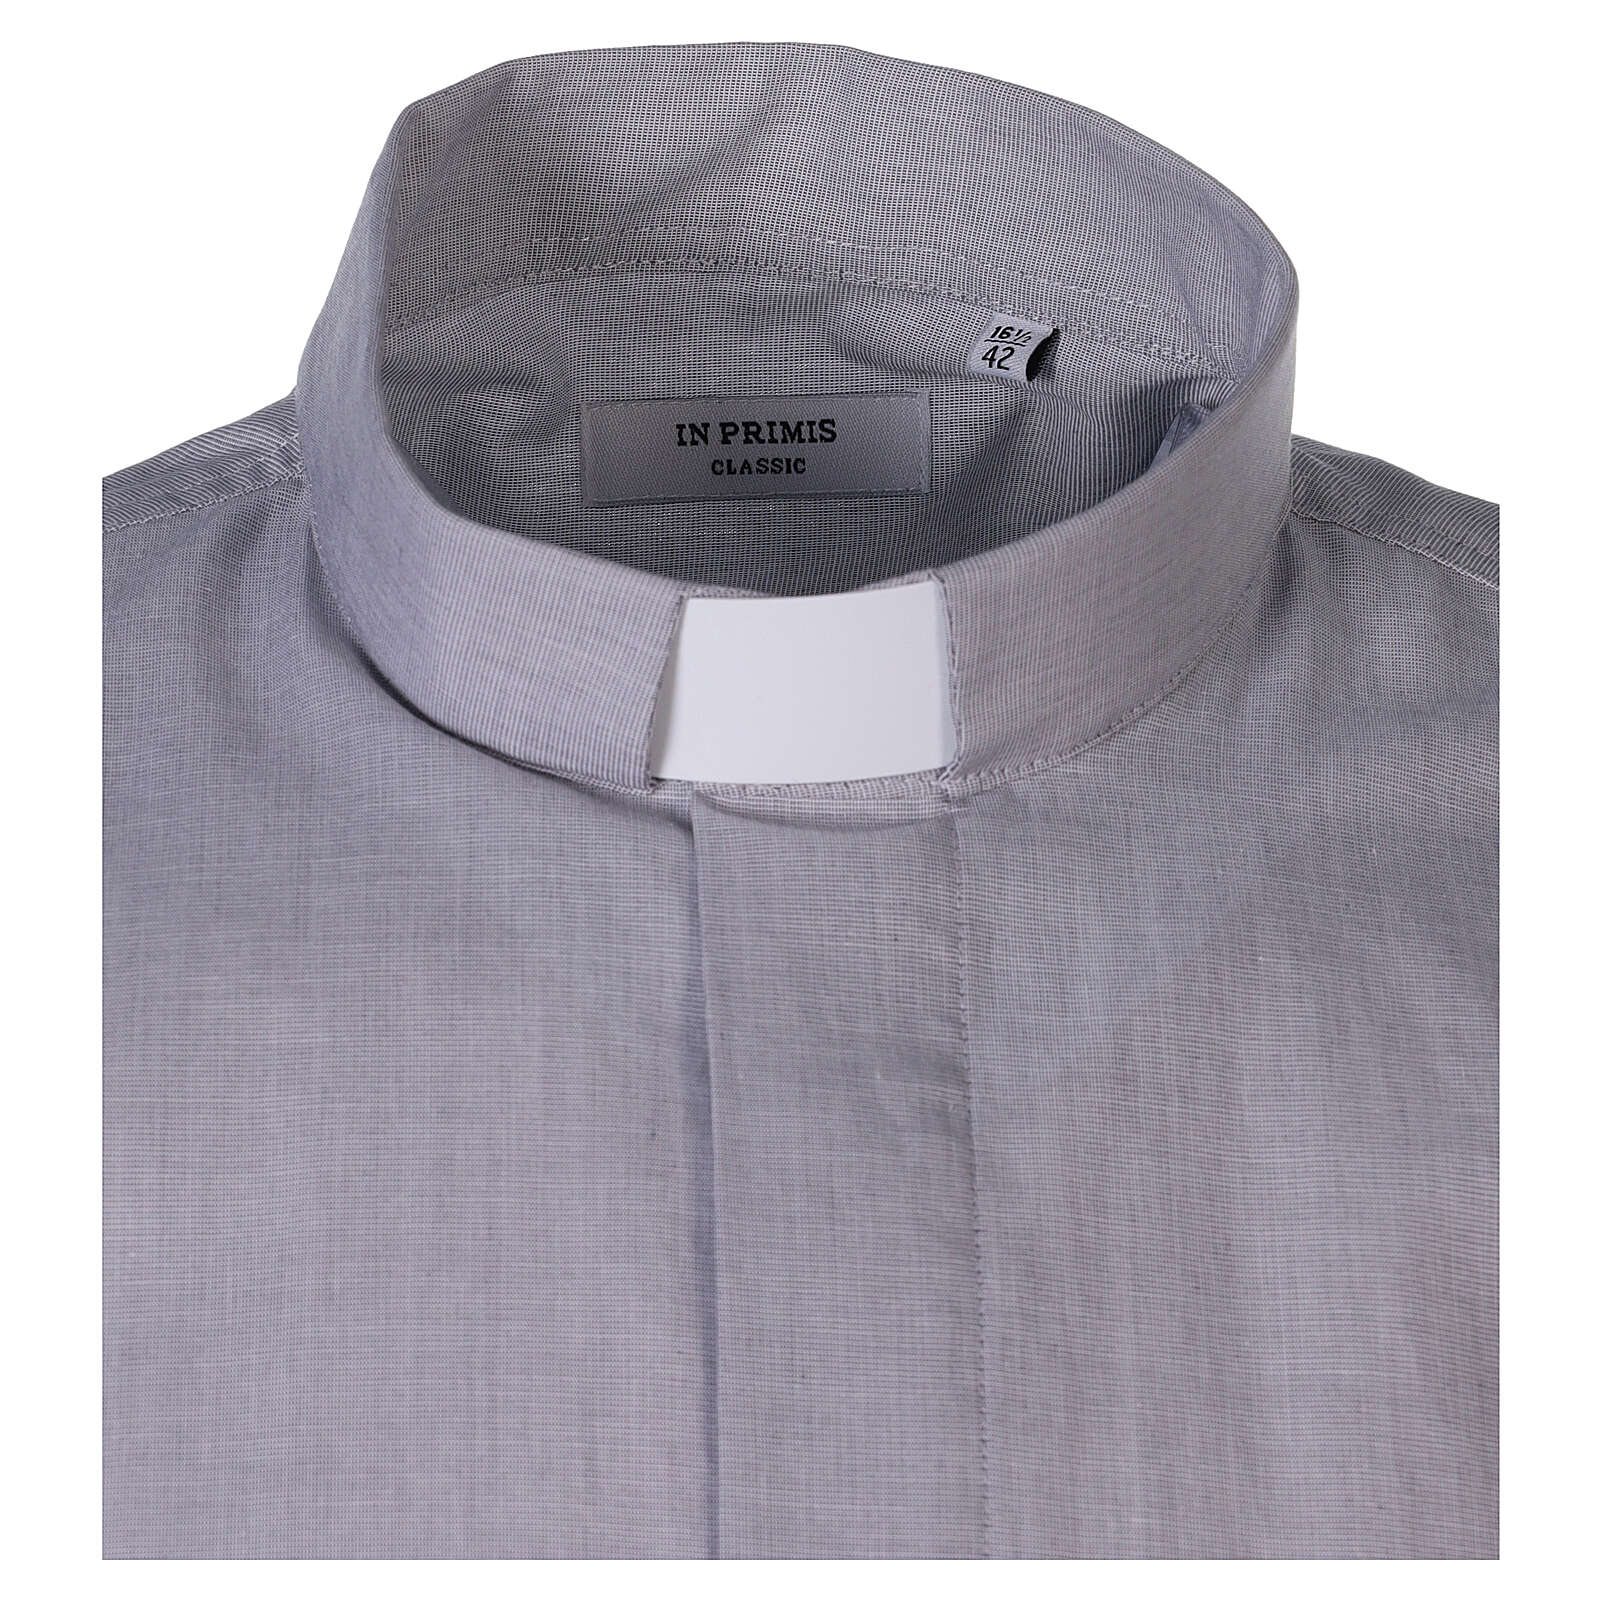 Camisa colarinho clergy filafil cinzento claro manga curta 4